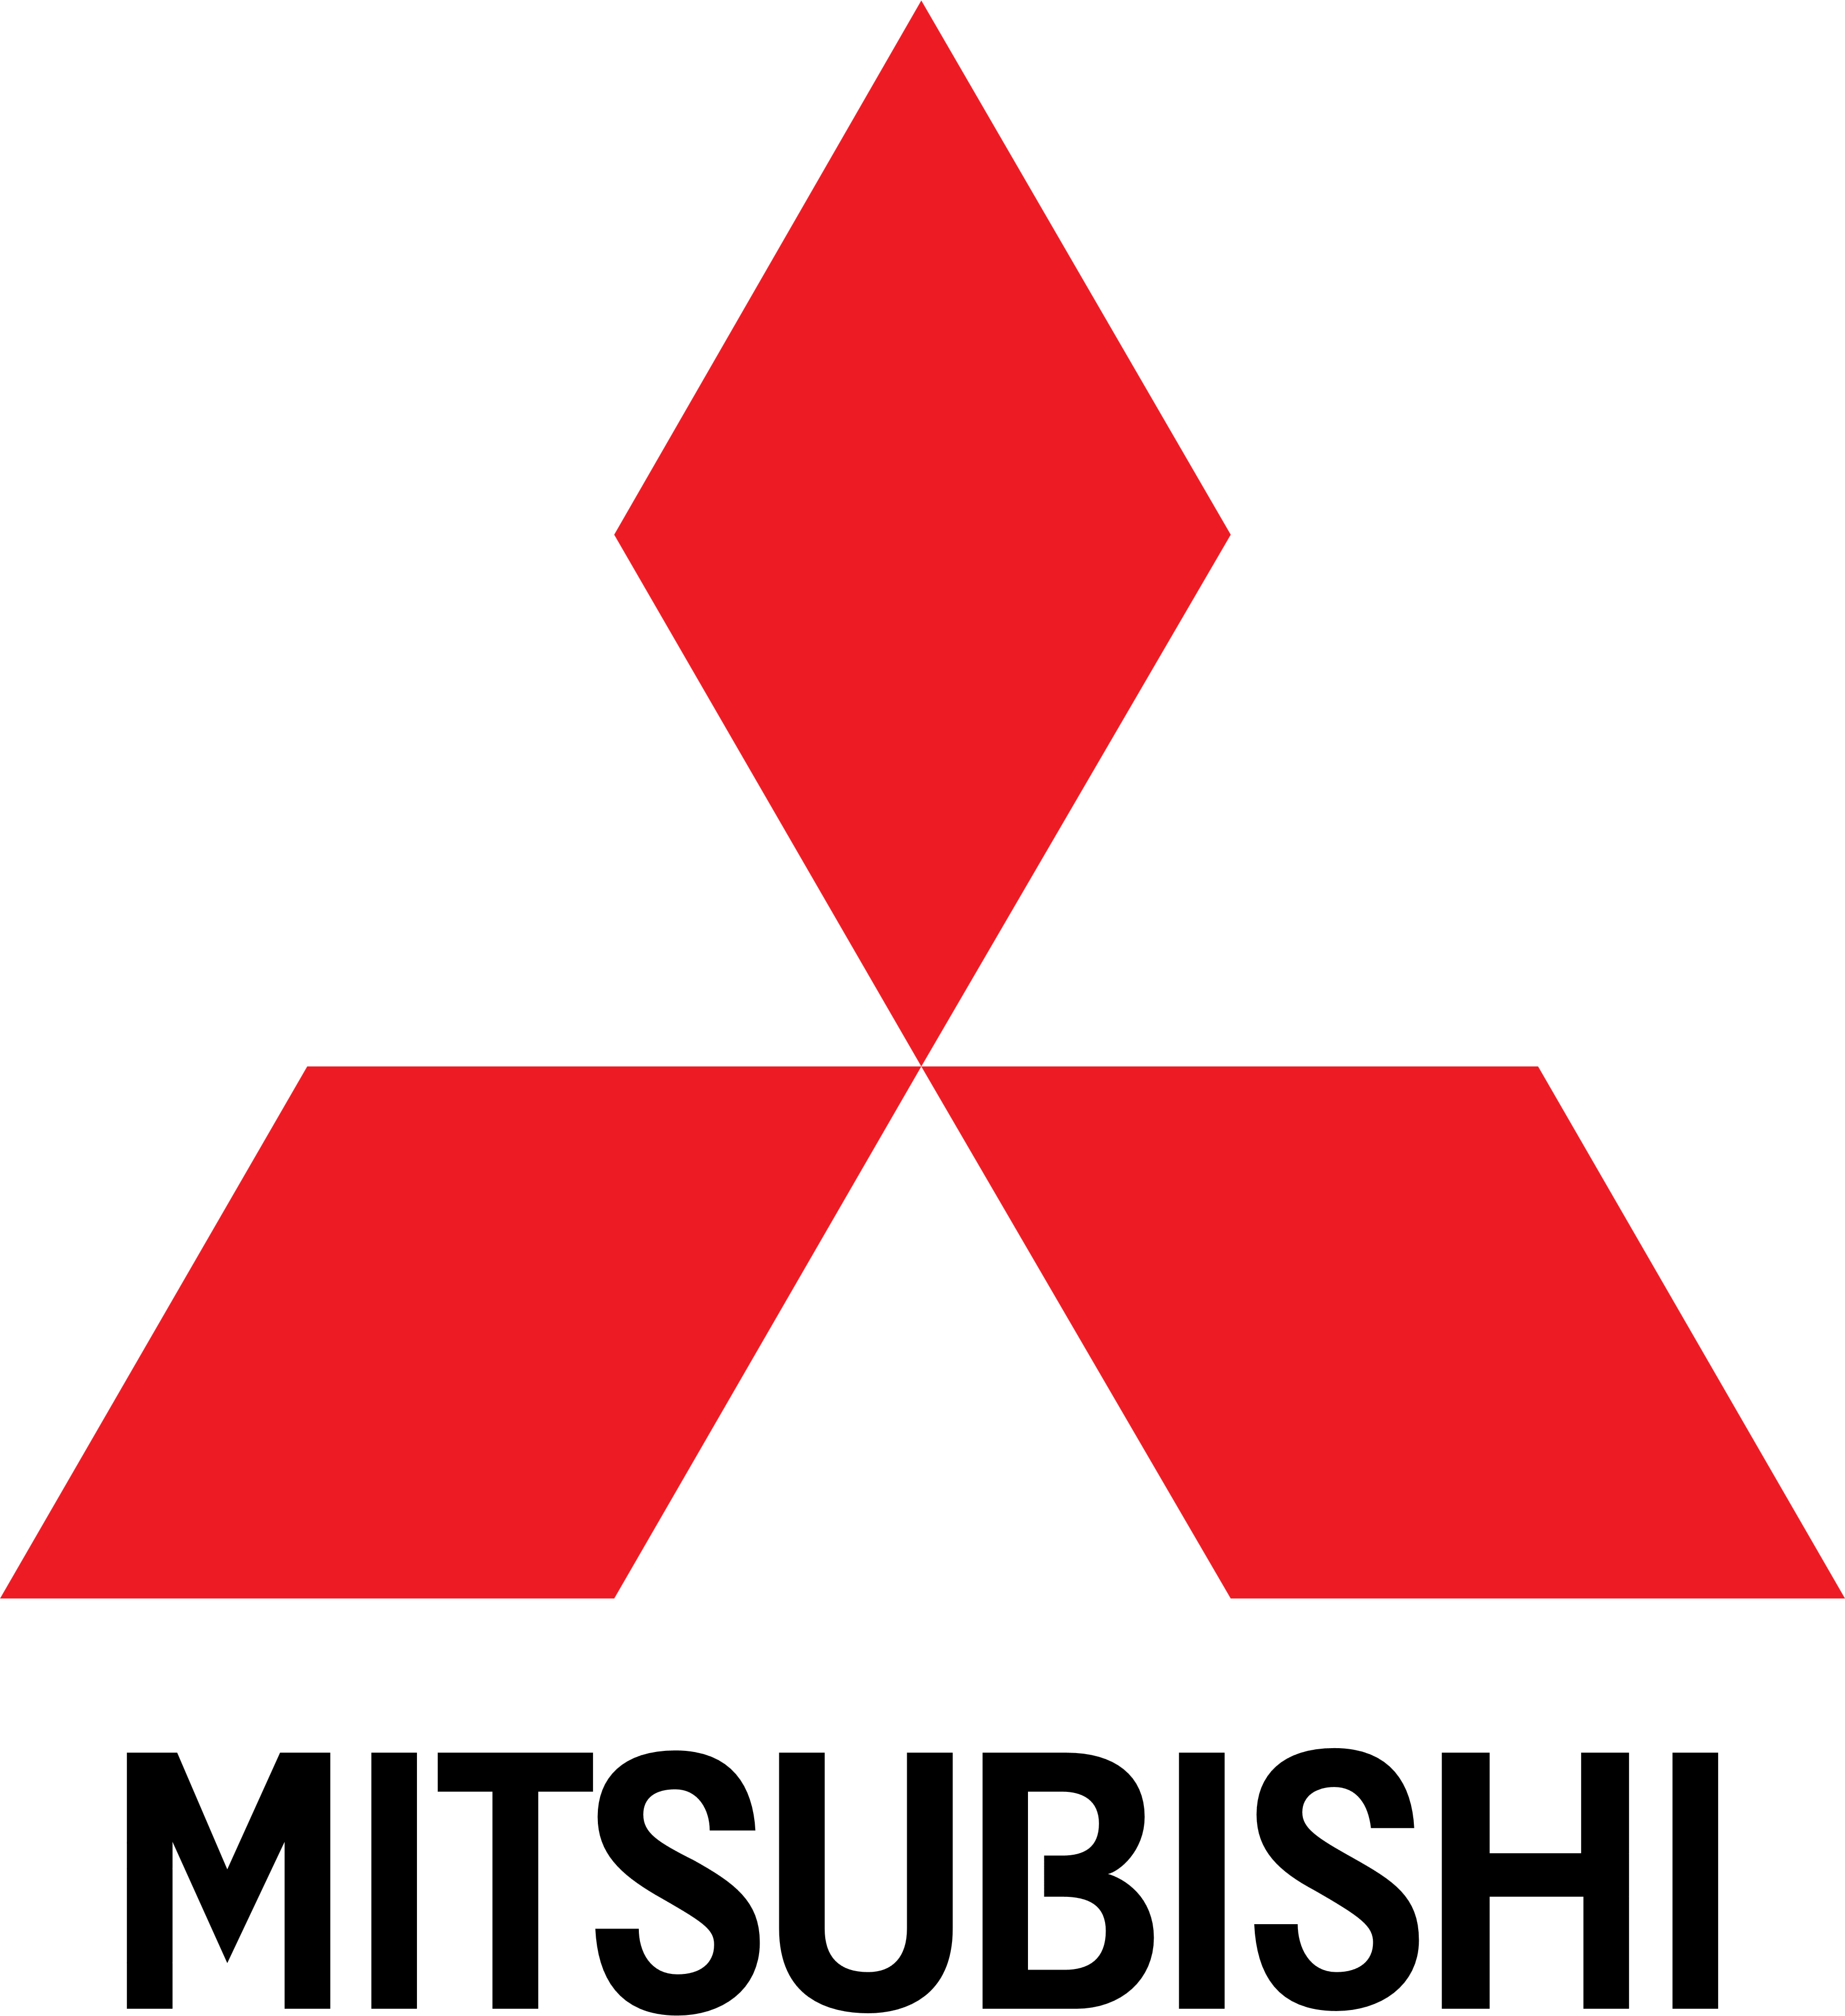 Excalibur Auto Body Works on Mitsubishi